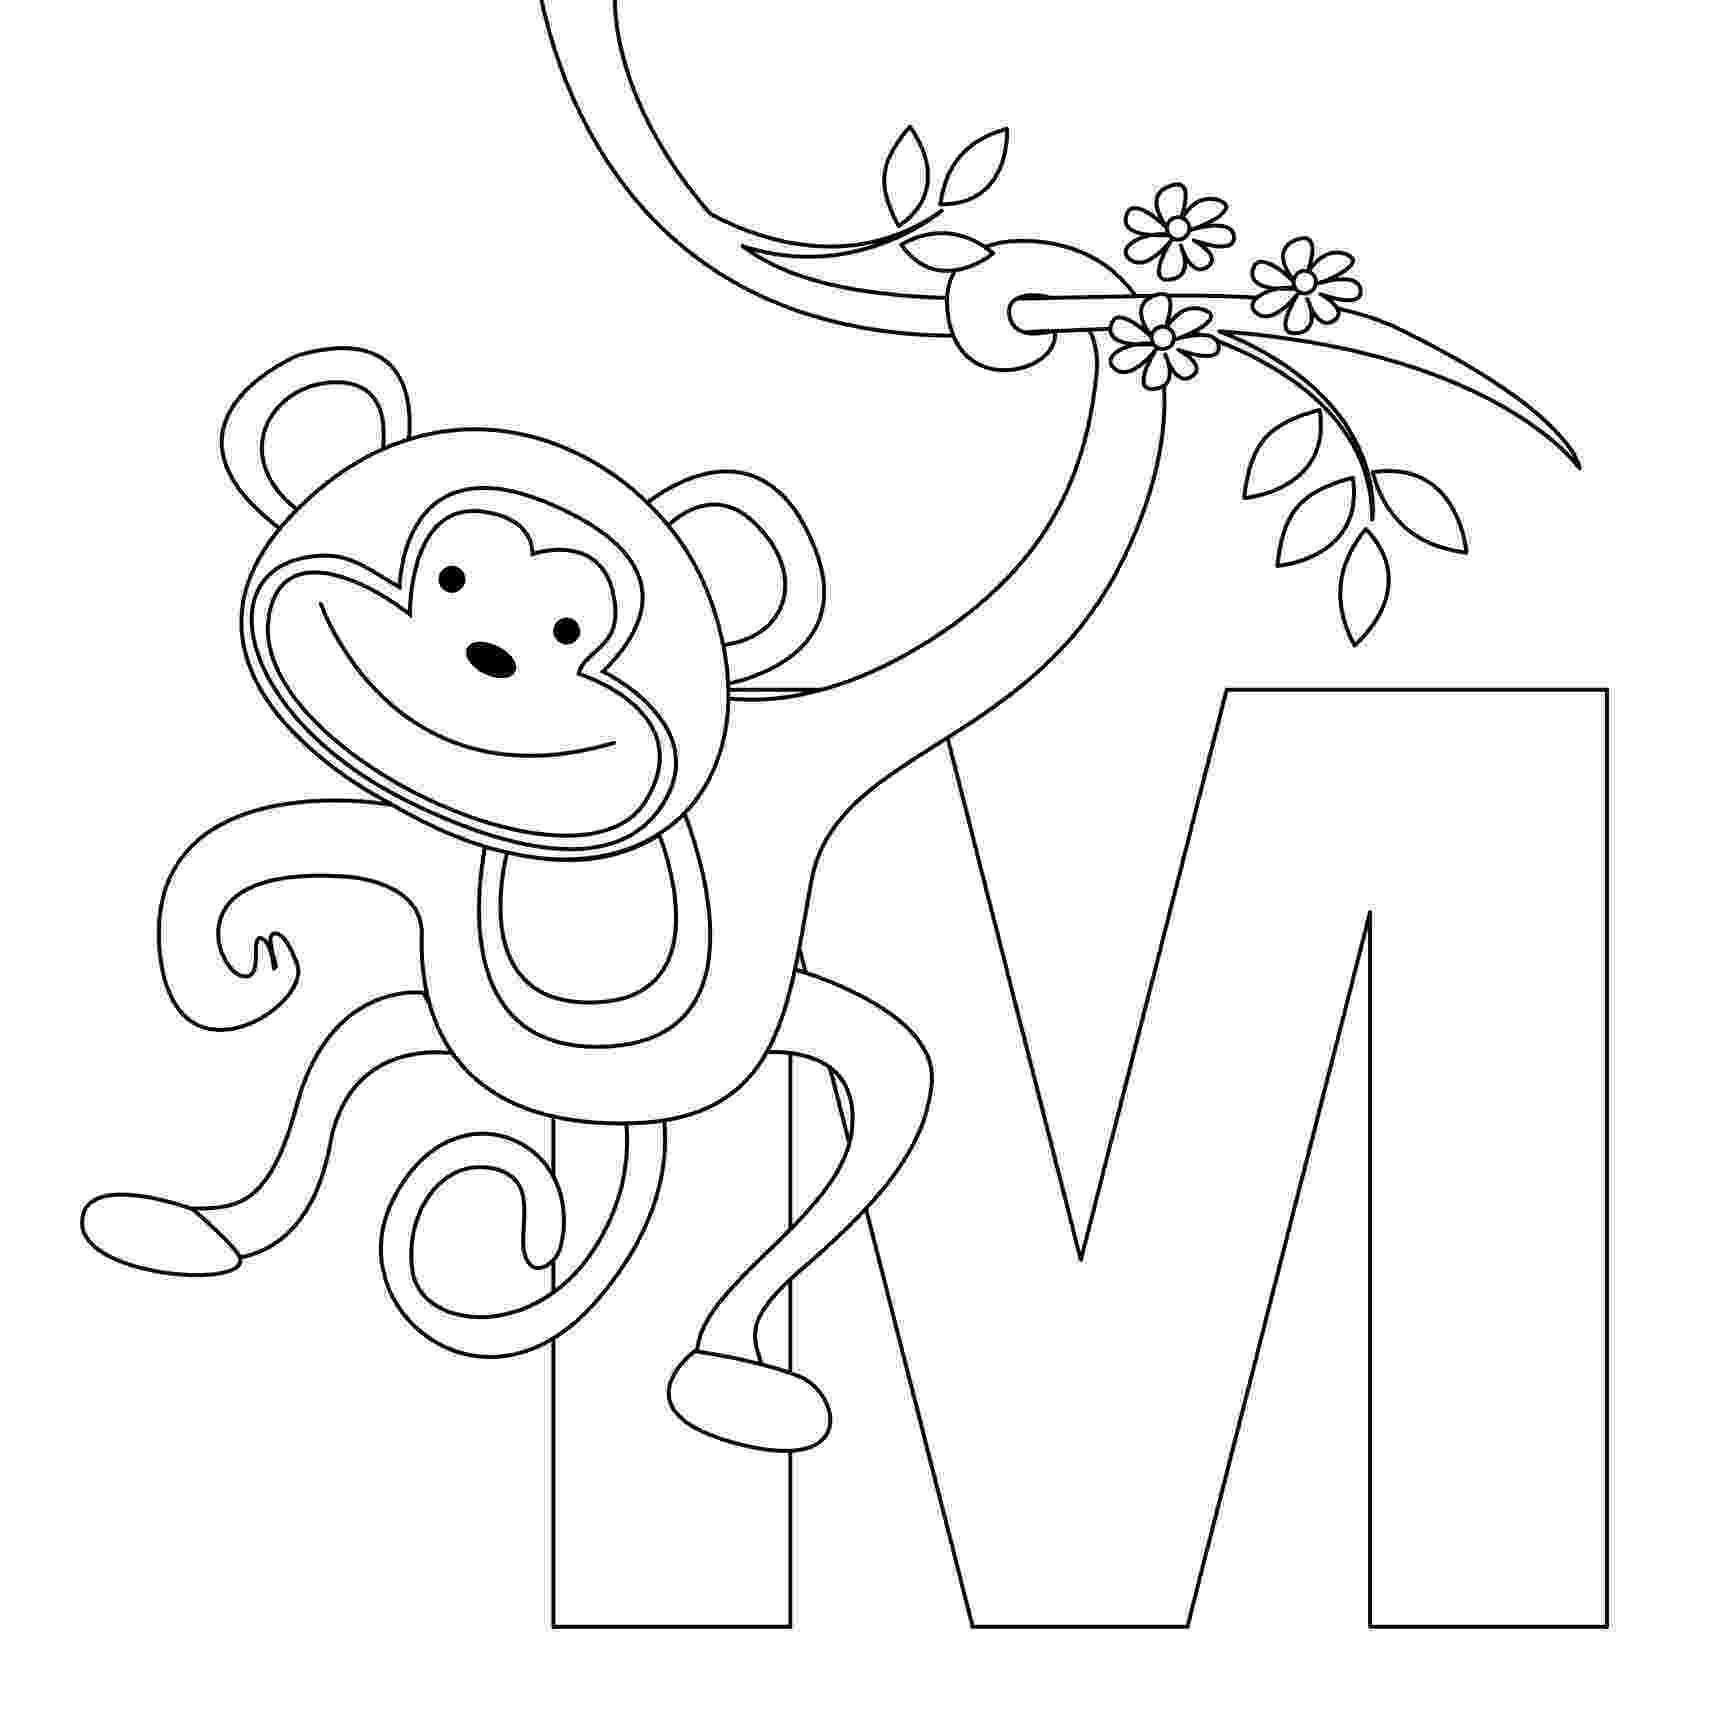 alphabet coloring free printable alphabet coloring pages for kids best alphabet coloring 1 3